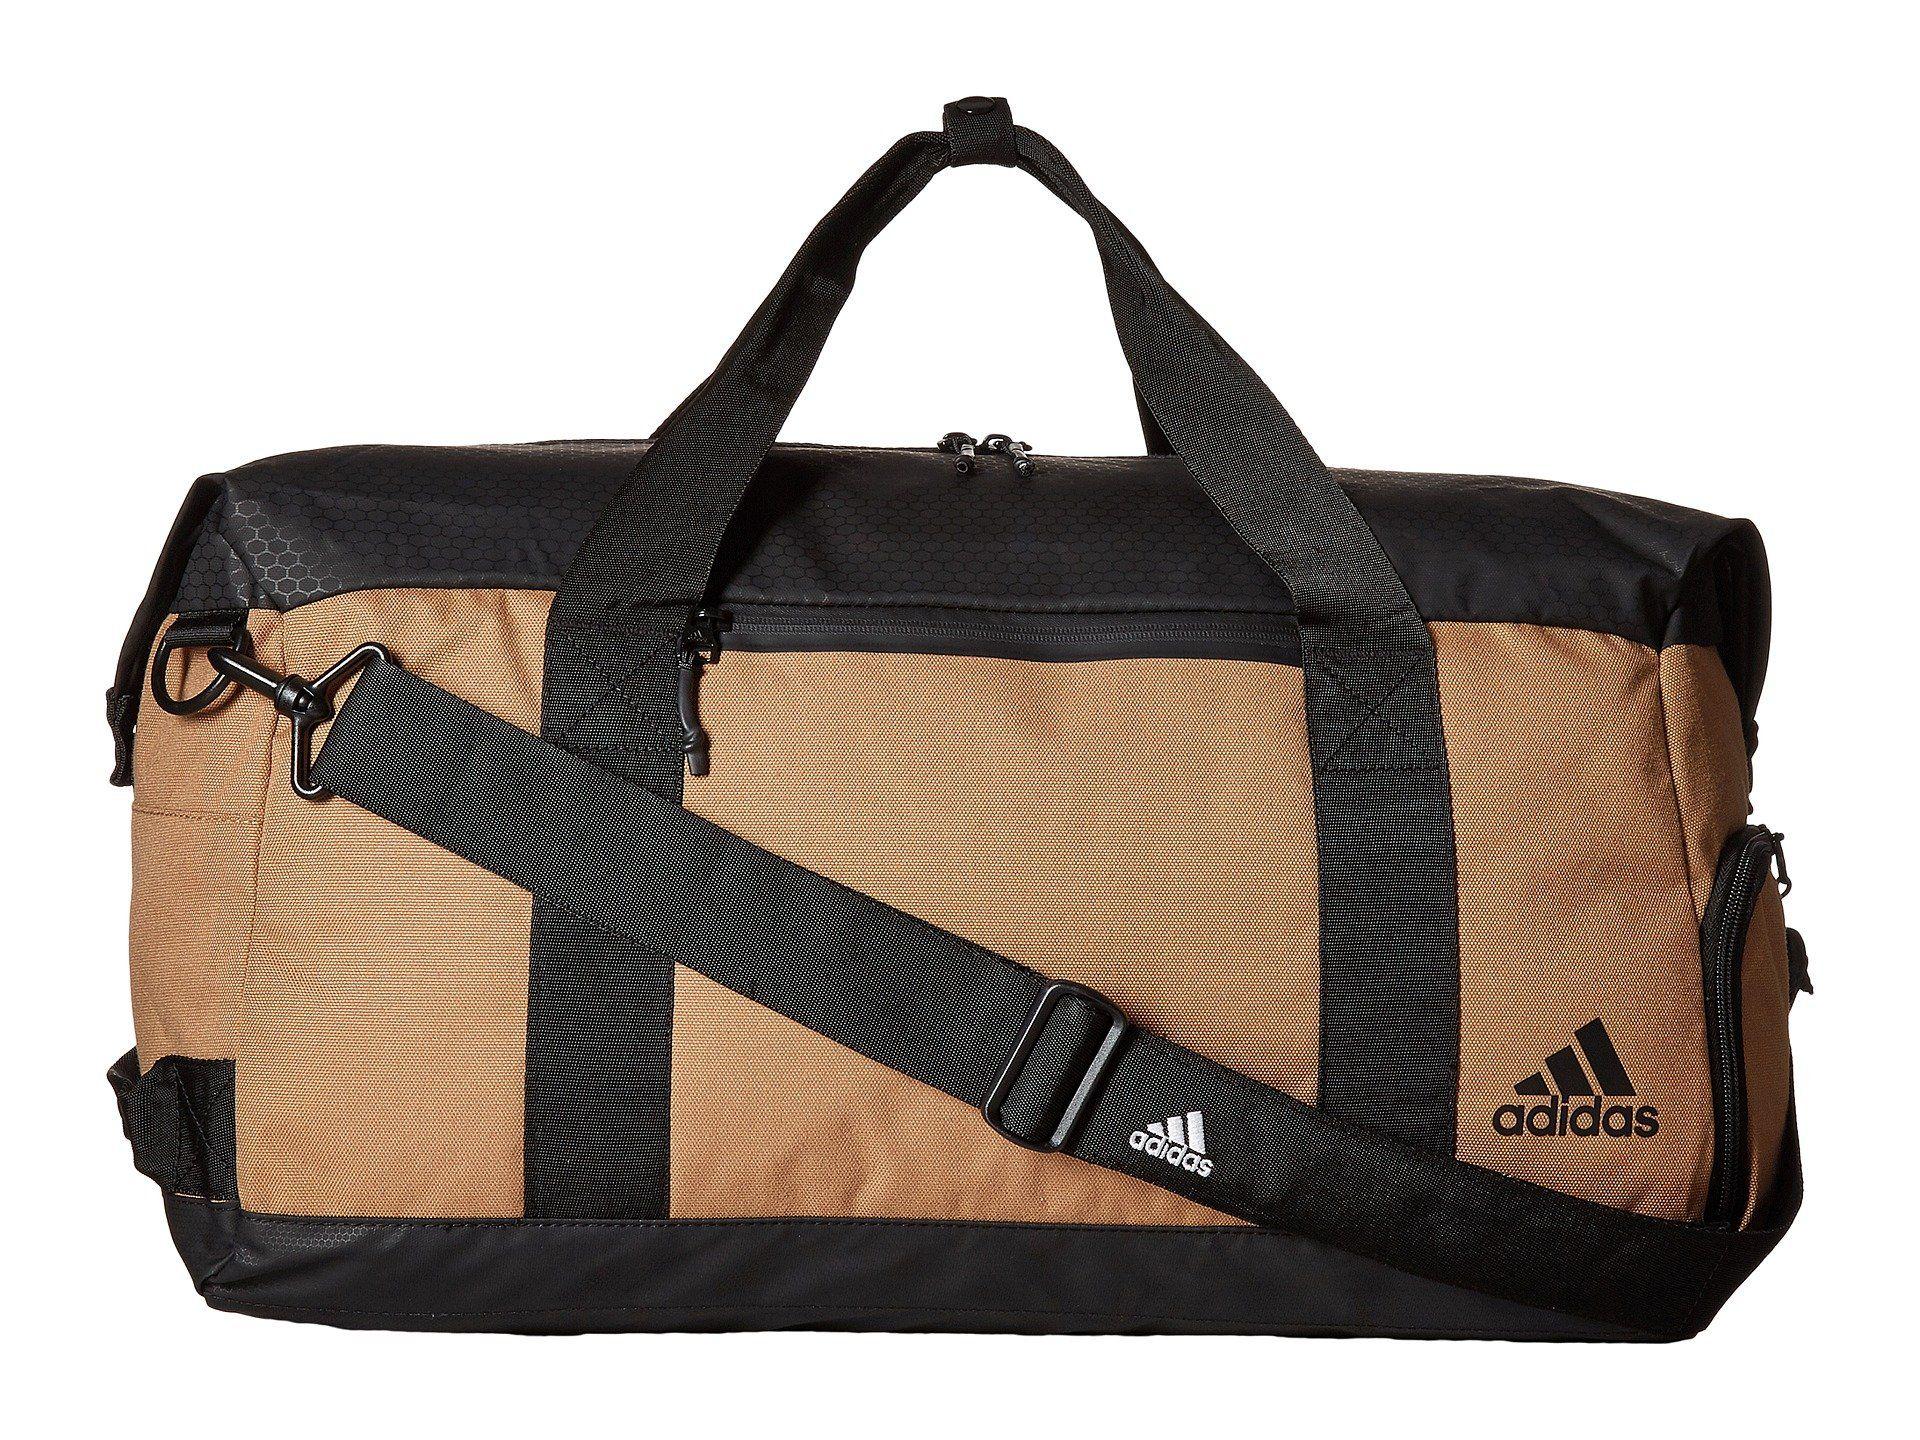 16ecfc28a1 ADIDAS ORIGINALS Sport ID Duffel.  adidasoriginals  bags  shoulder bags   hand bags  polyester  lining